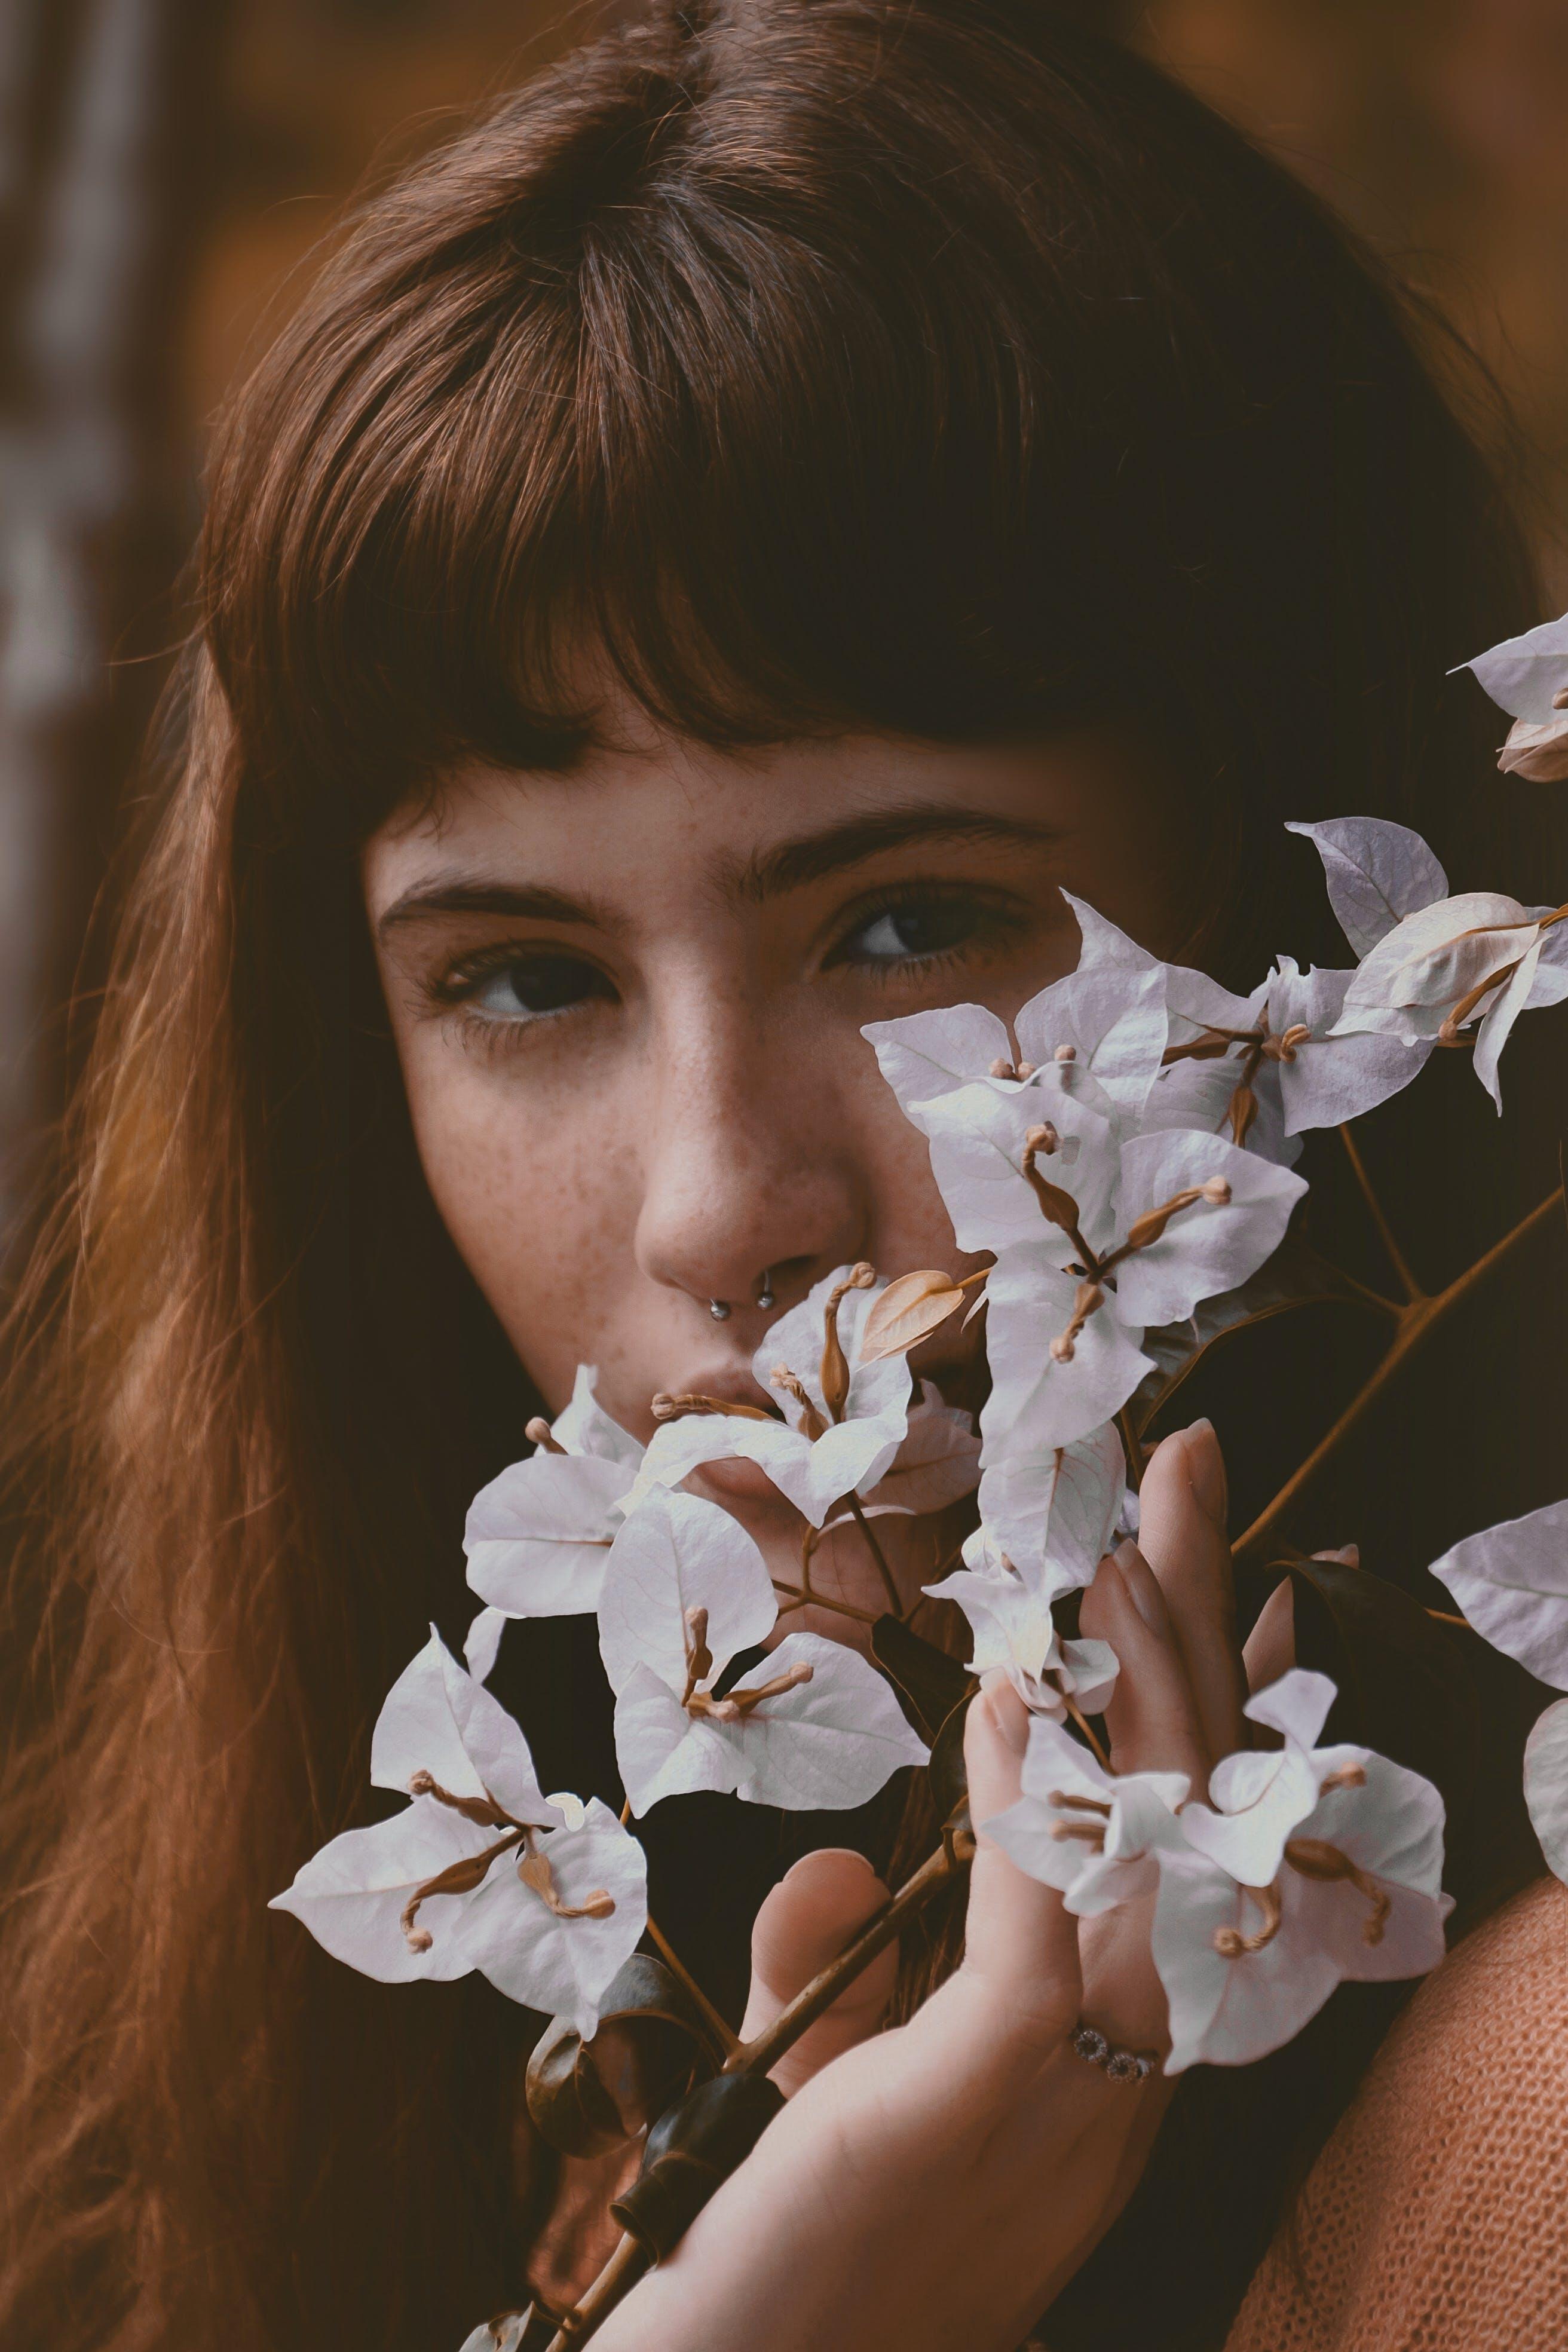 Woman Touching White Petaled Flower